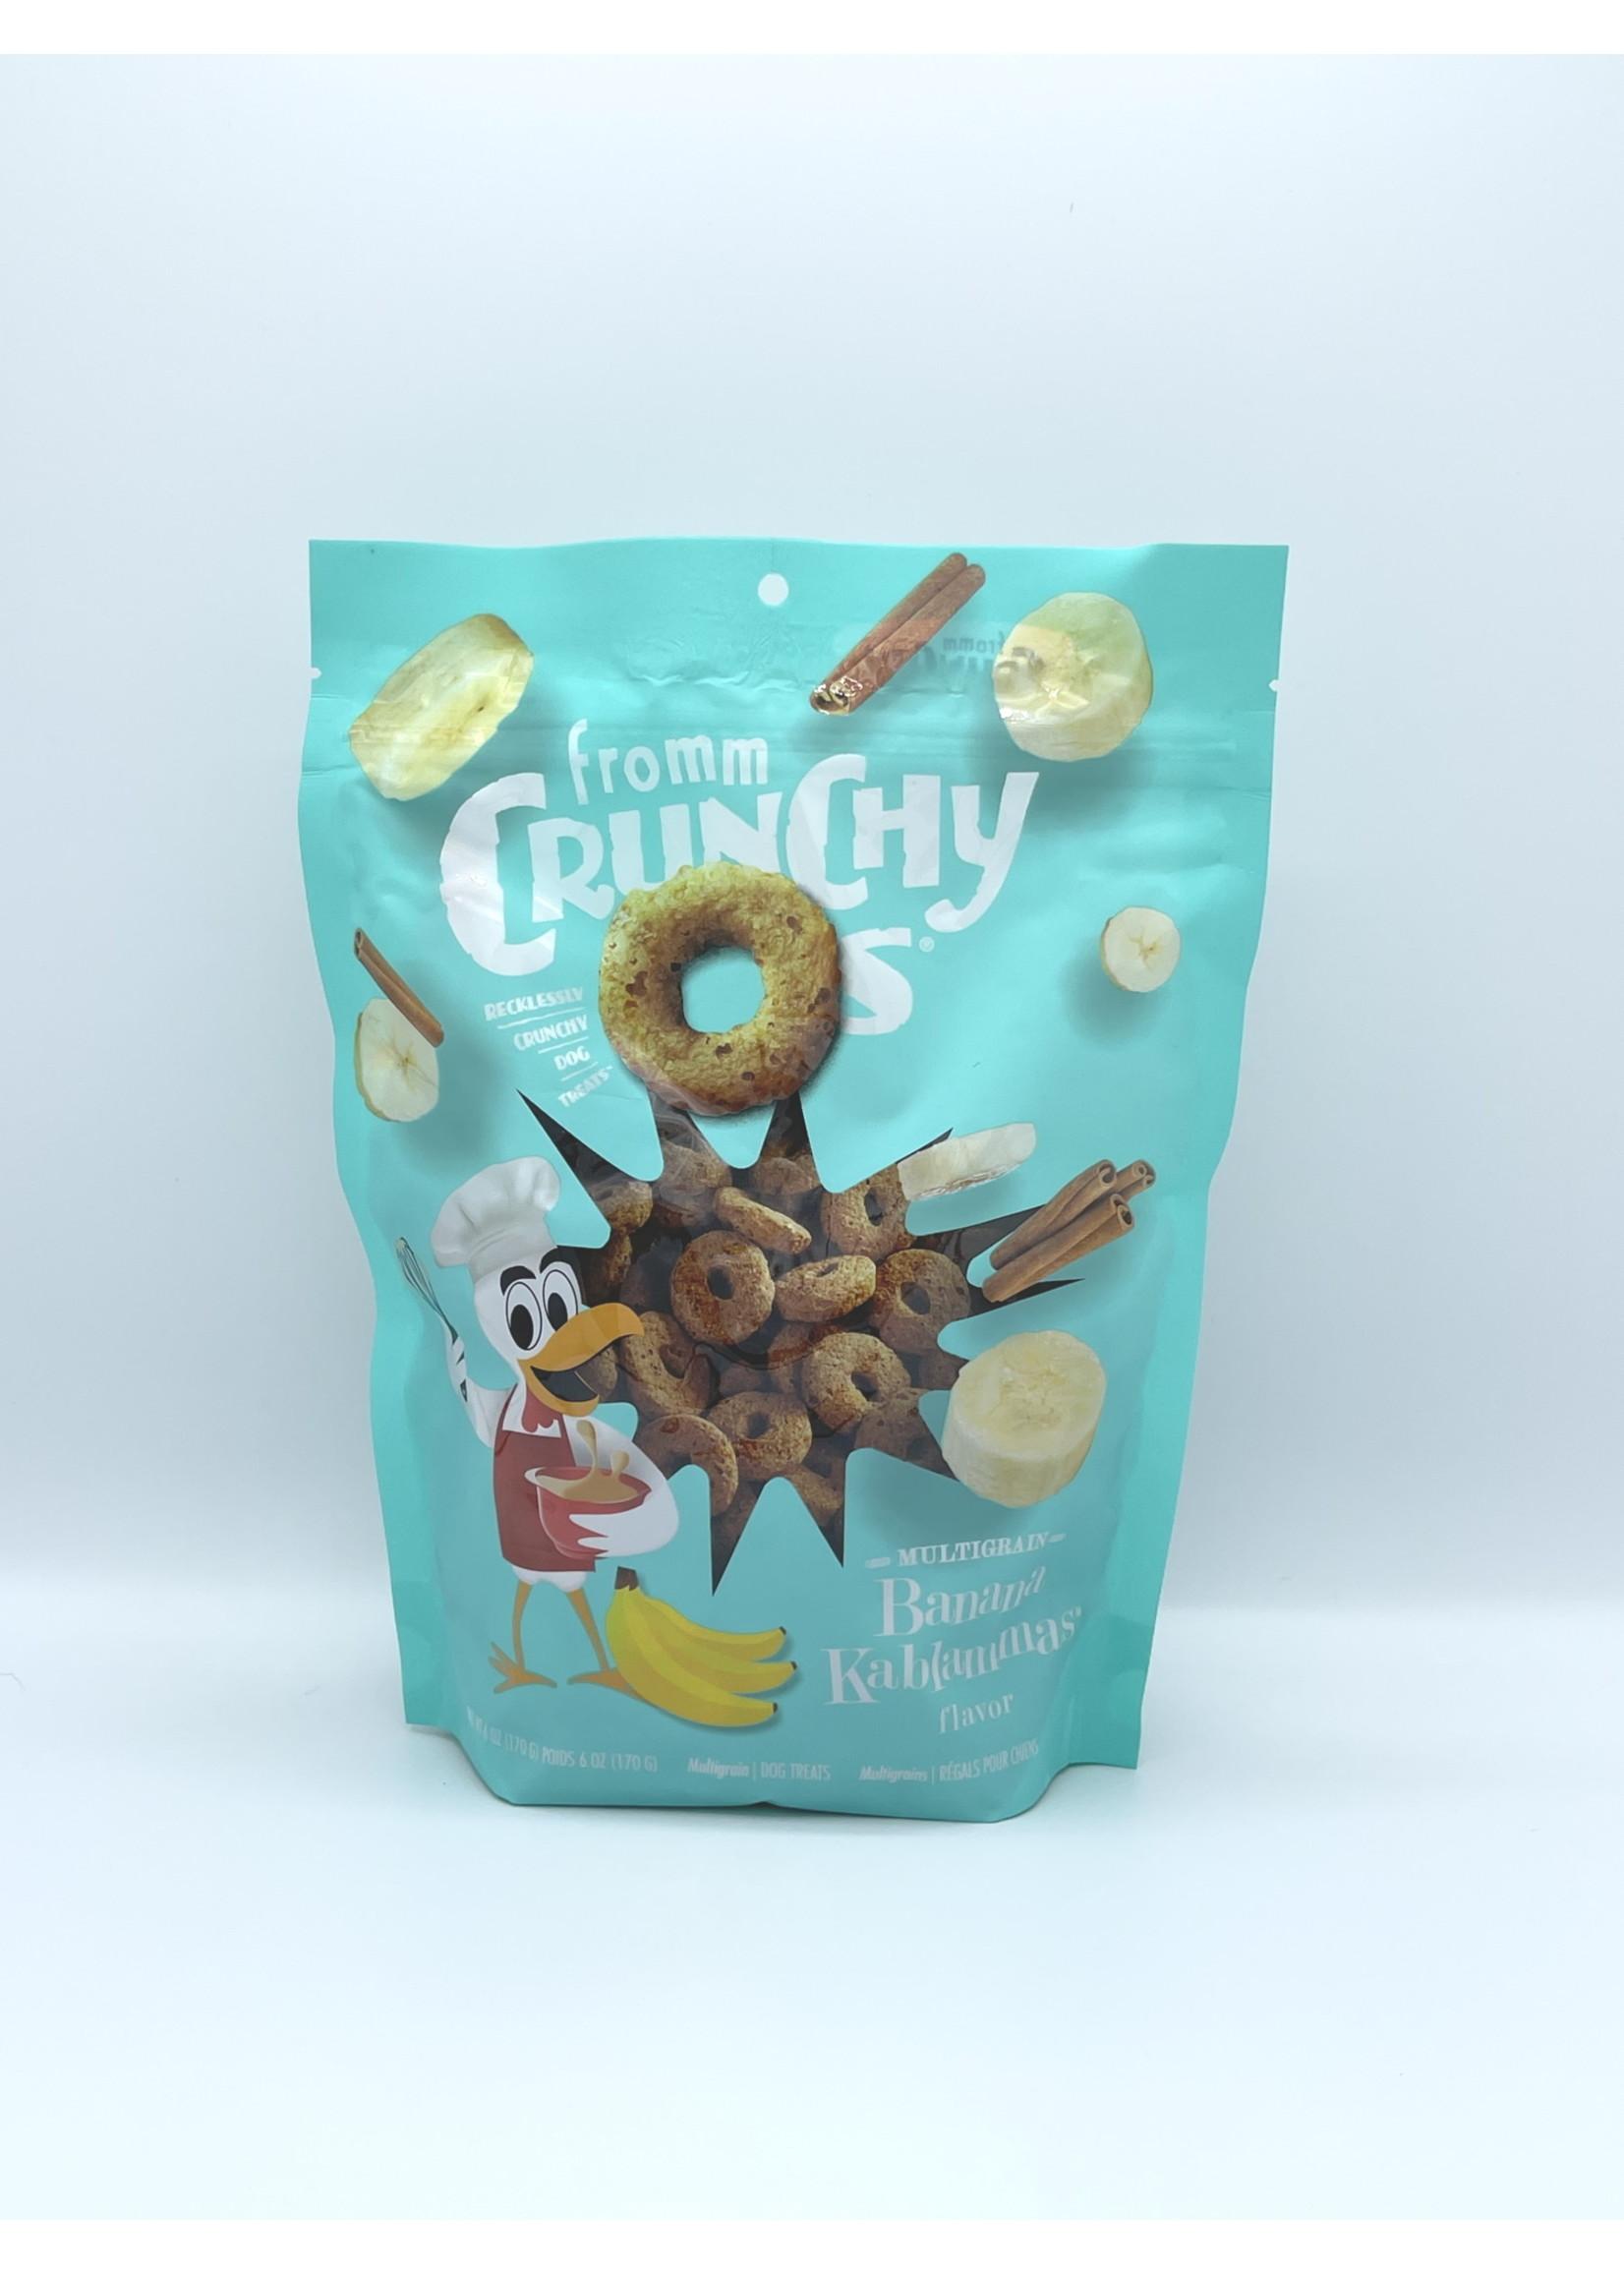 Fromm Fromm Crunchy O's Banana Kablammas, 6oz Bag